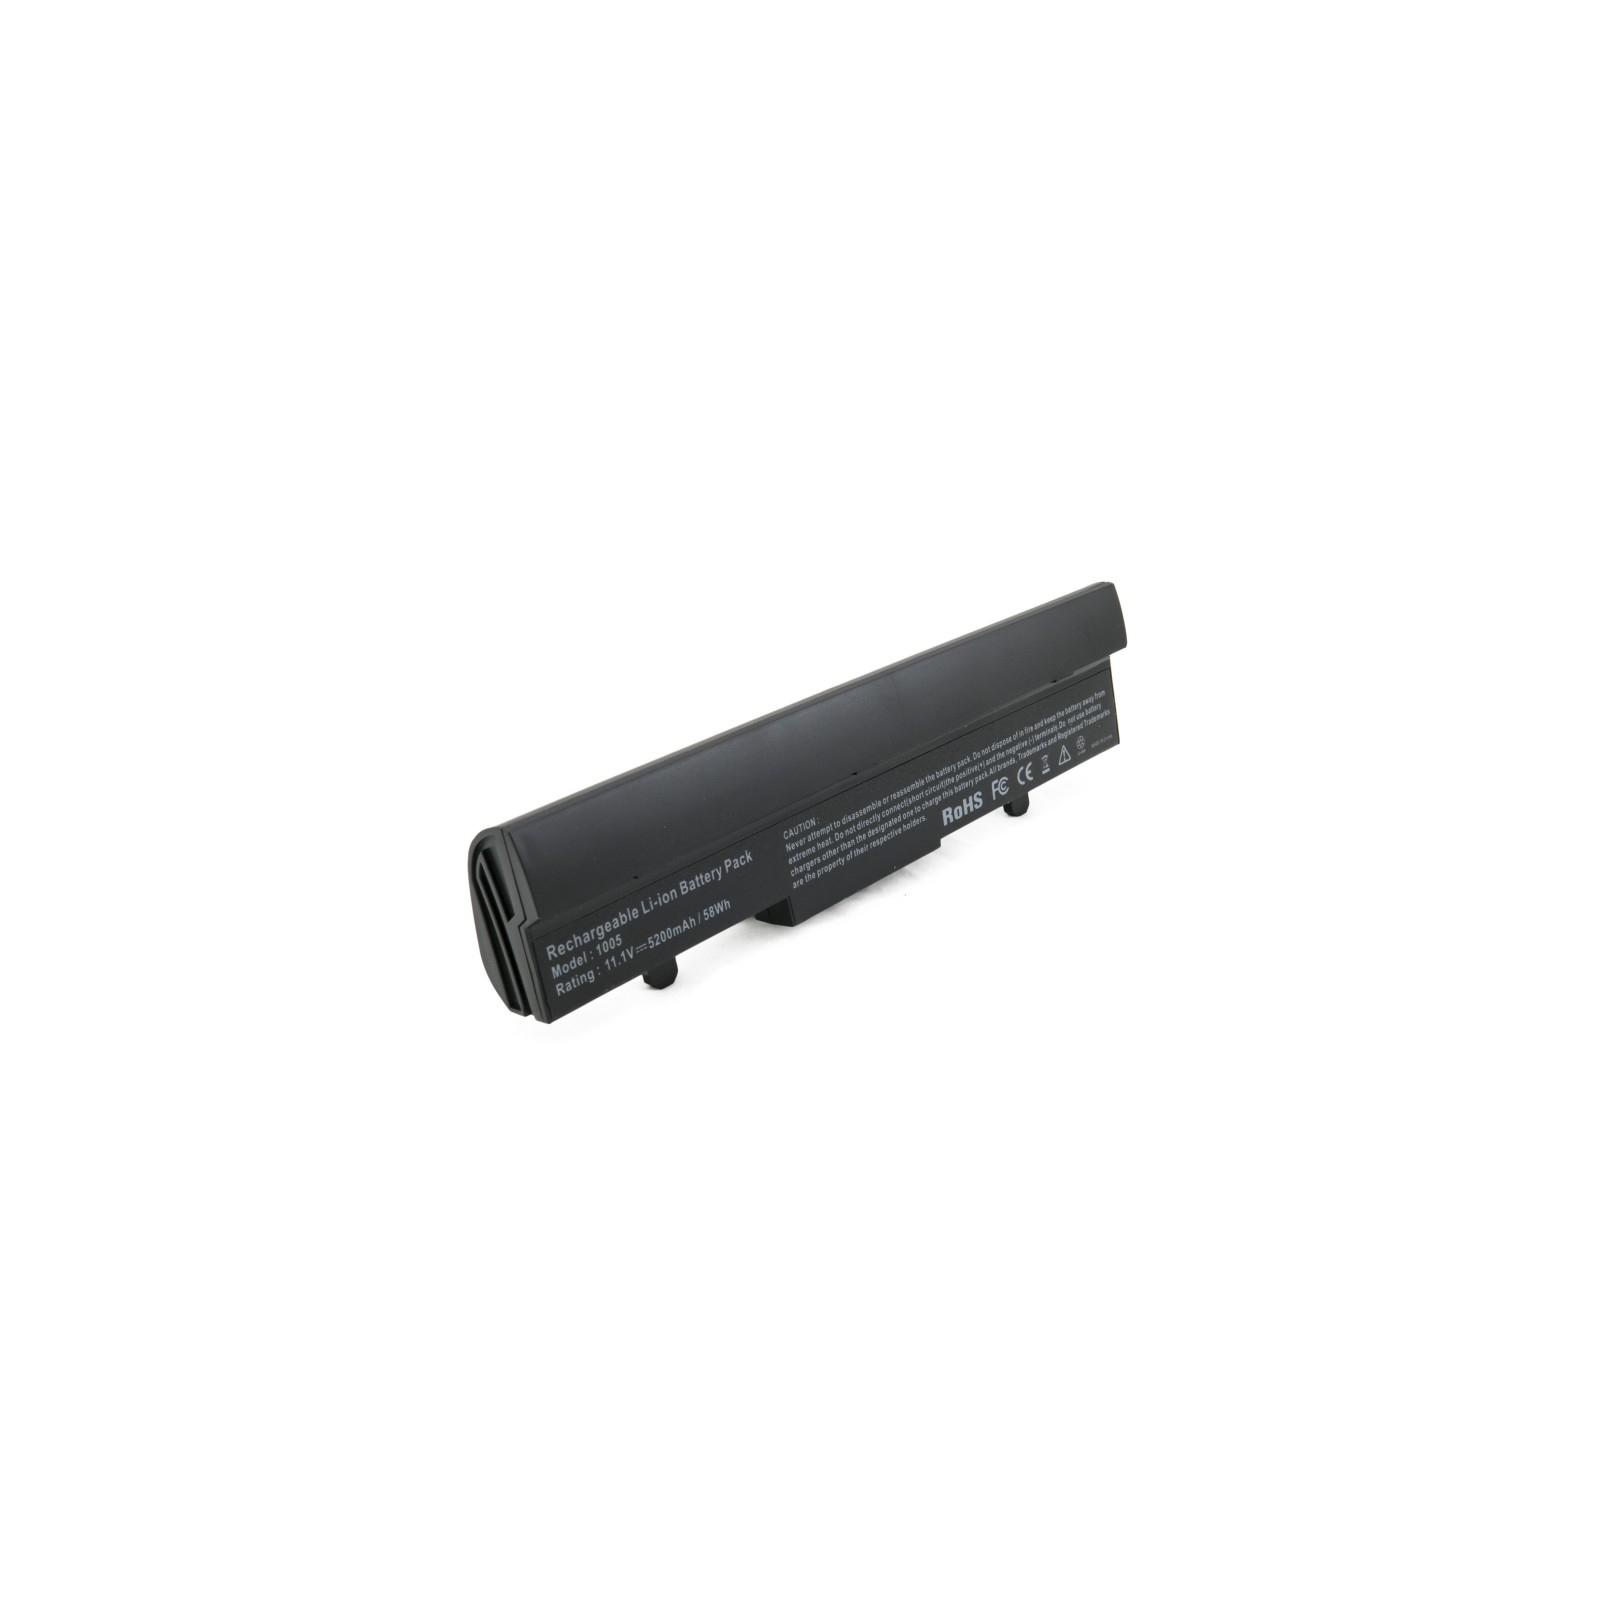 Аккумулятор для ноутбука Asus Eee PC 1005 (AL31-1005) 5200 mAh EXTRADIGITAL (BNA3920)